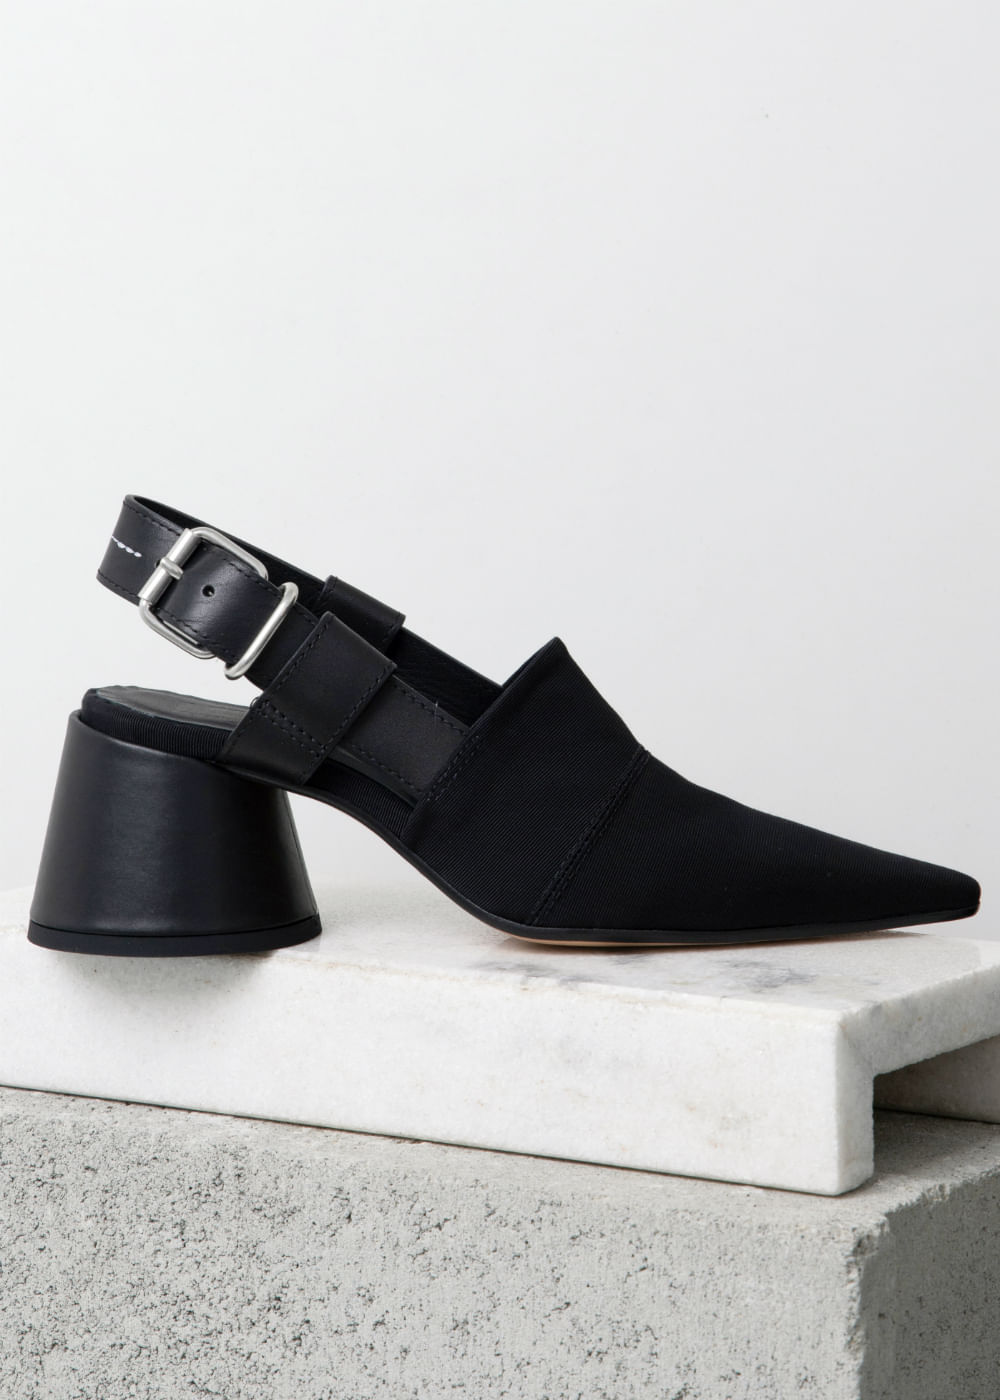 Sapato De Couro Sligback Preta Preta 36 It